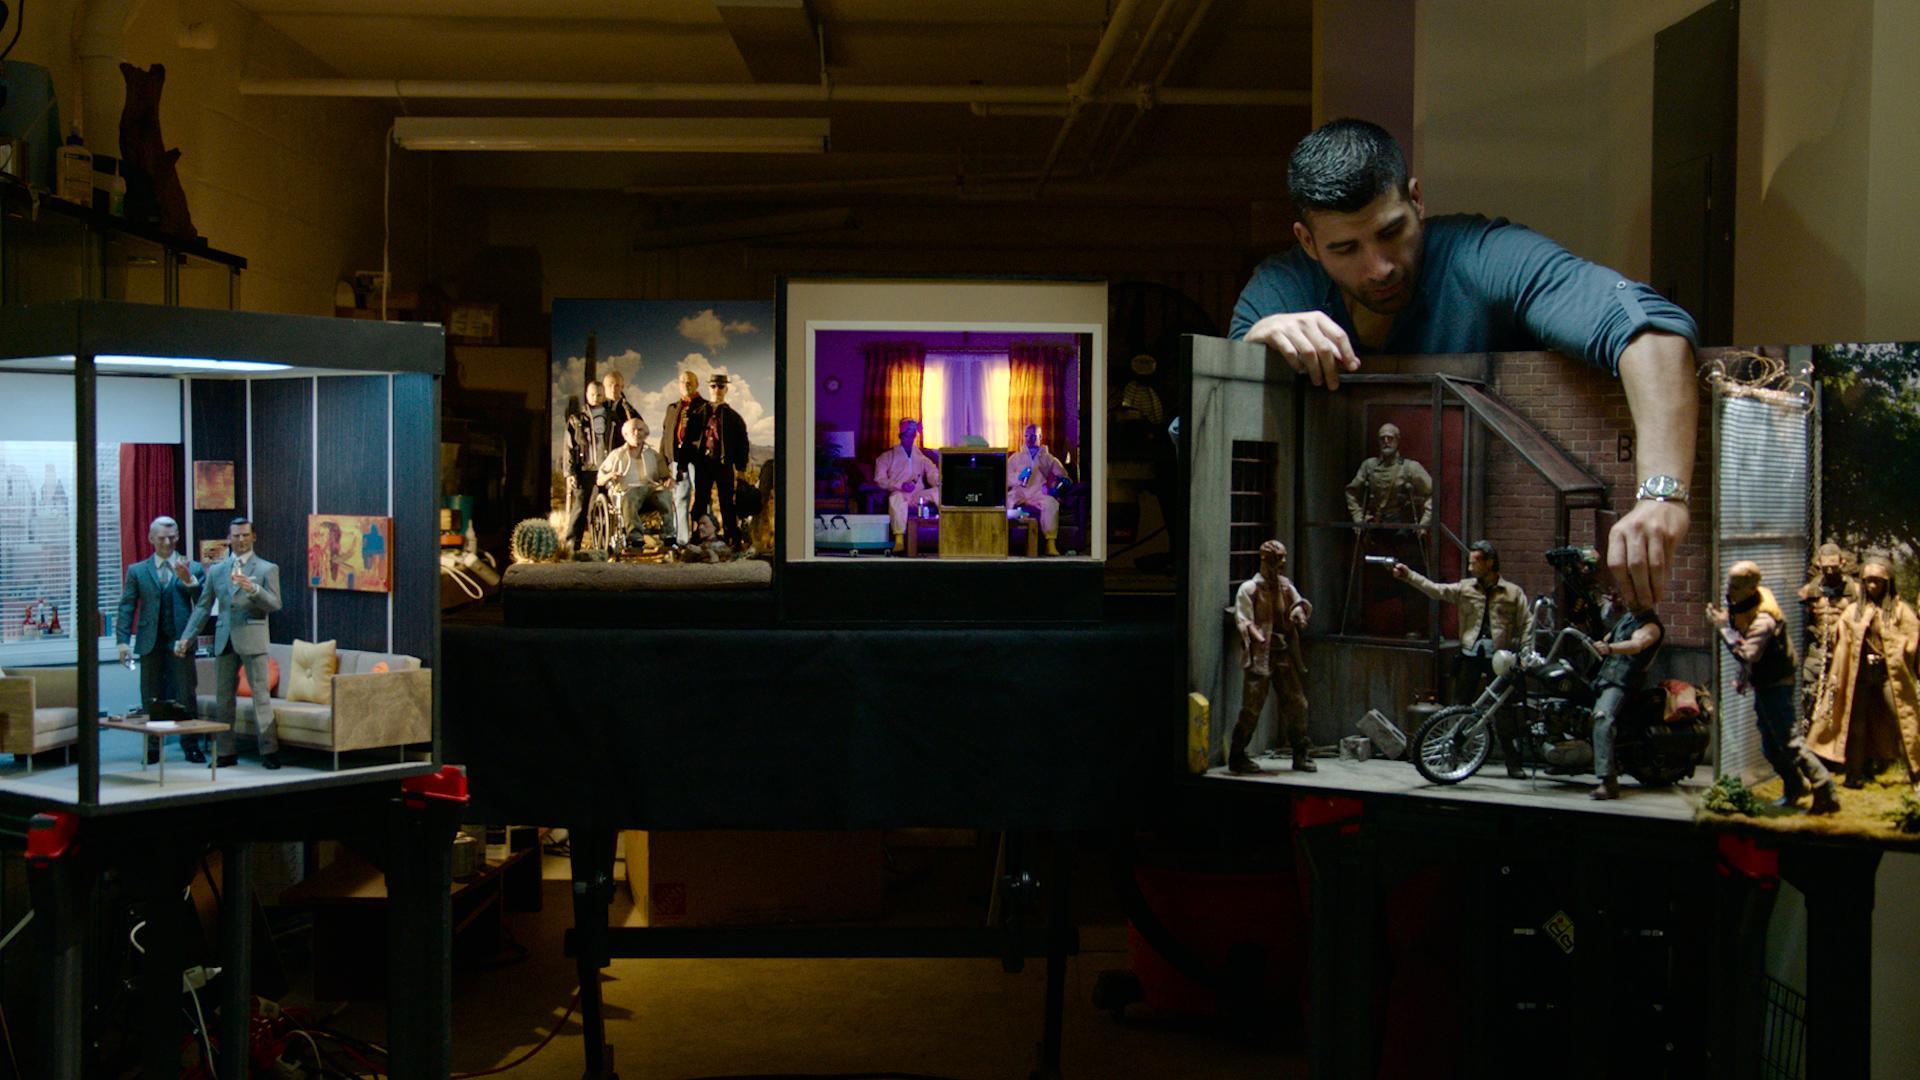 Thumbnail for Dioramas